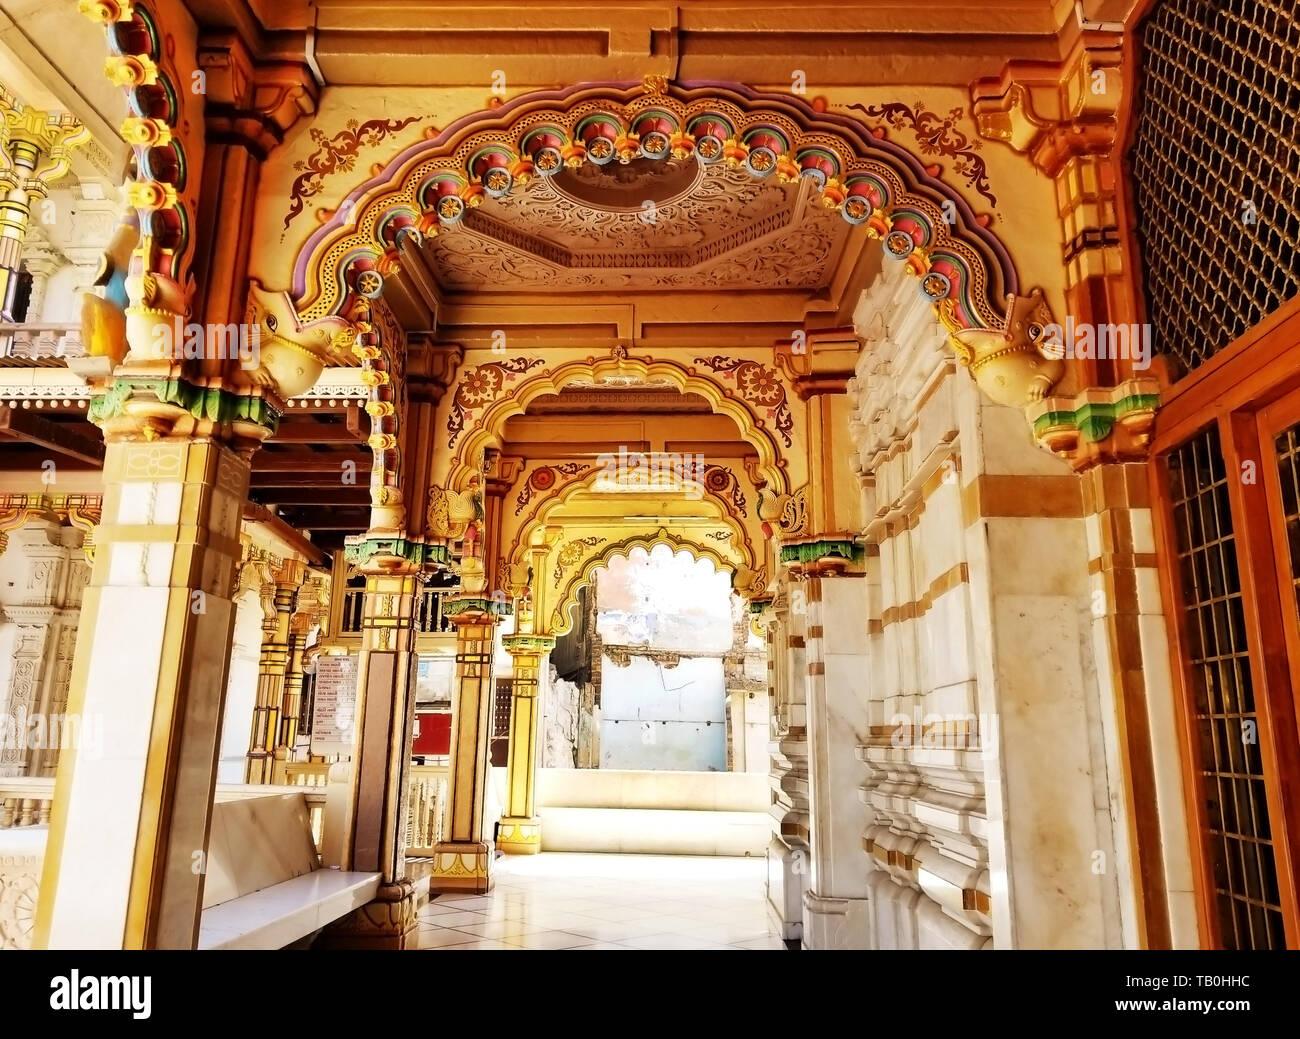 Exterior wooden architecture of Swaminarayan Temple, Kalupur, Ahmedabad in Gujarat, India. - Stock Image